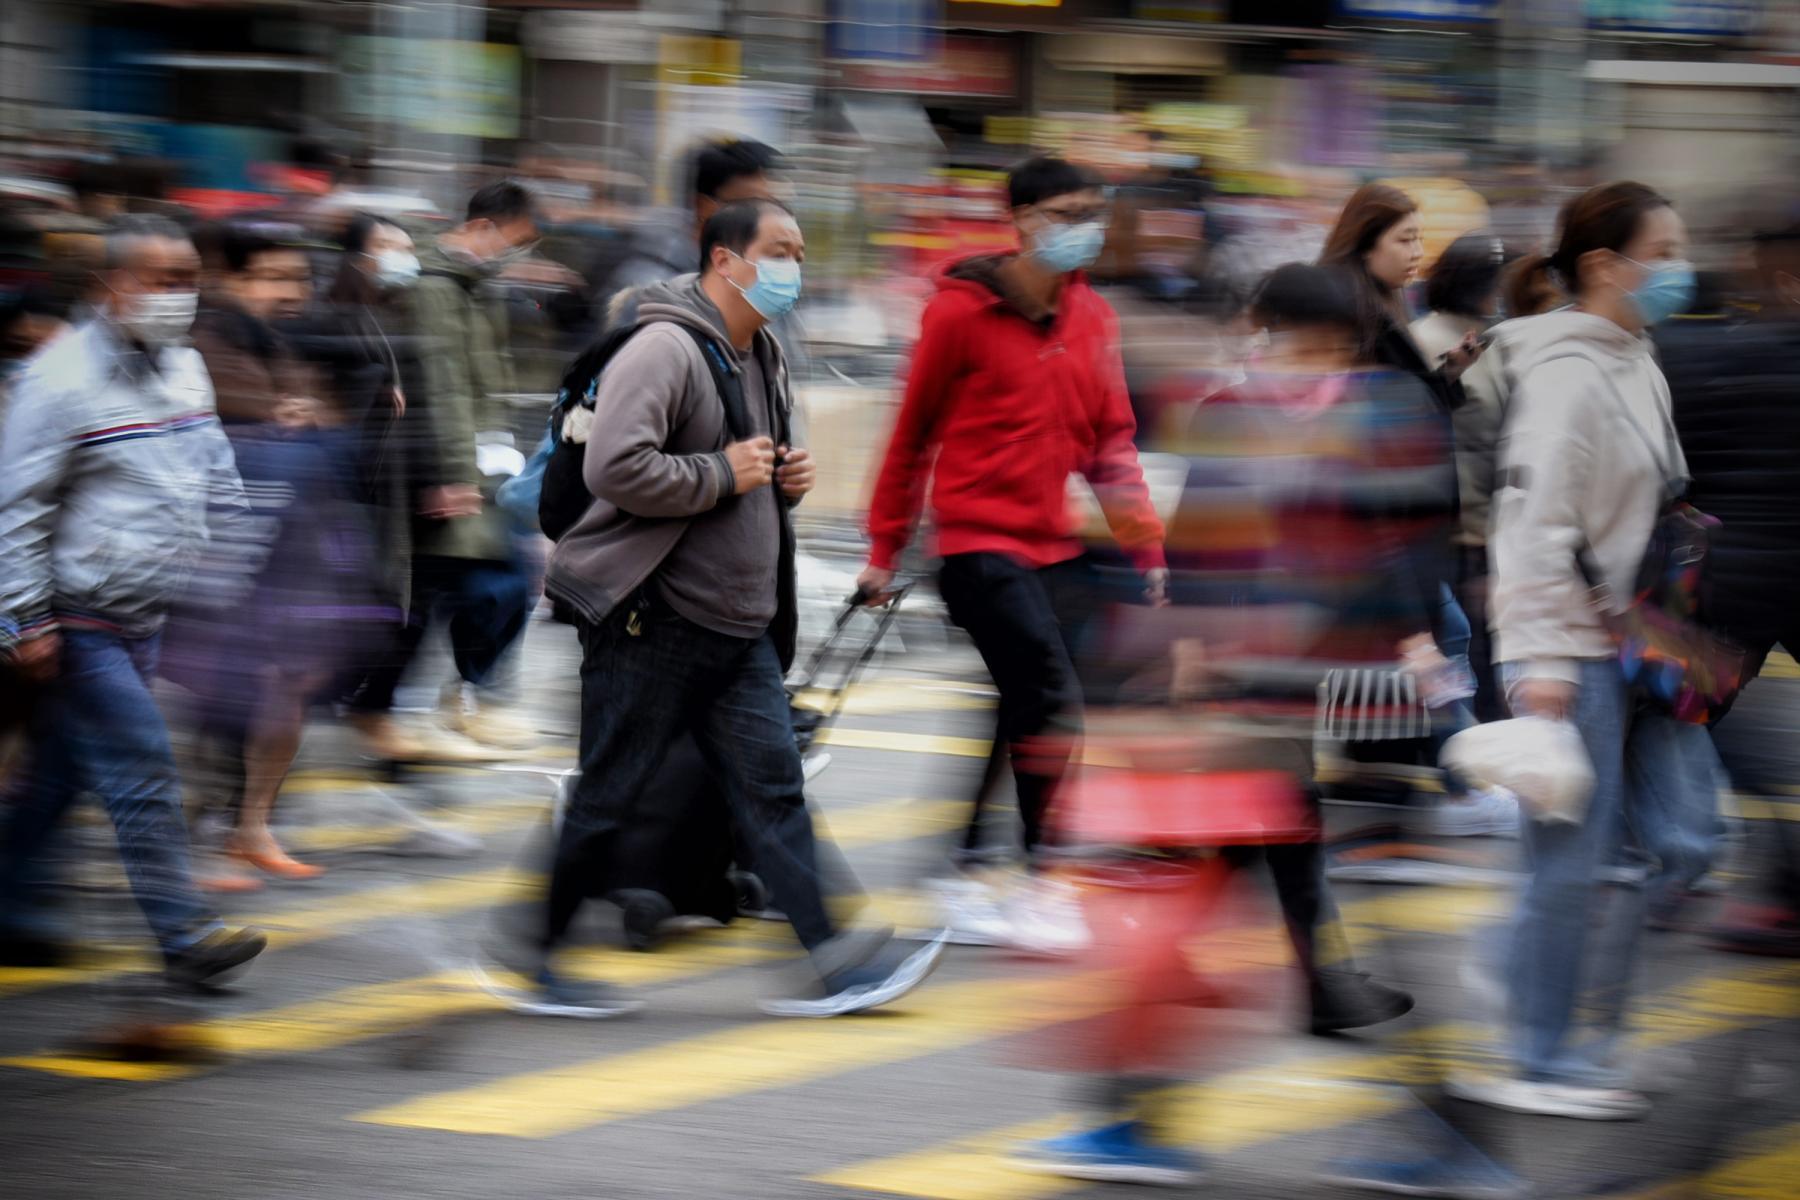 hk_c_9、Dicky  2020-1香港拍攝,疫情初臨,市民未知將來的景況,防疫物資短缺,一罩已難求,但仍要面對日常生活及上班工作,路上行人都是行色匆匆,大時代的景況,但相信總會共同渡過,明天會更好!.jpg